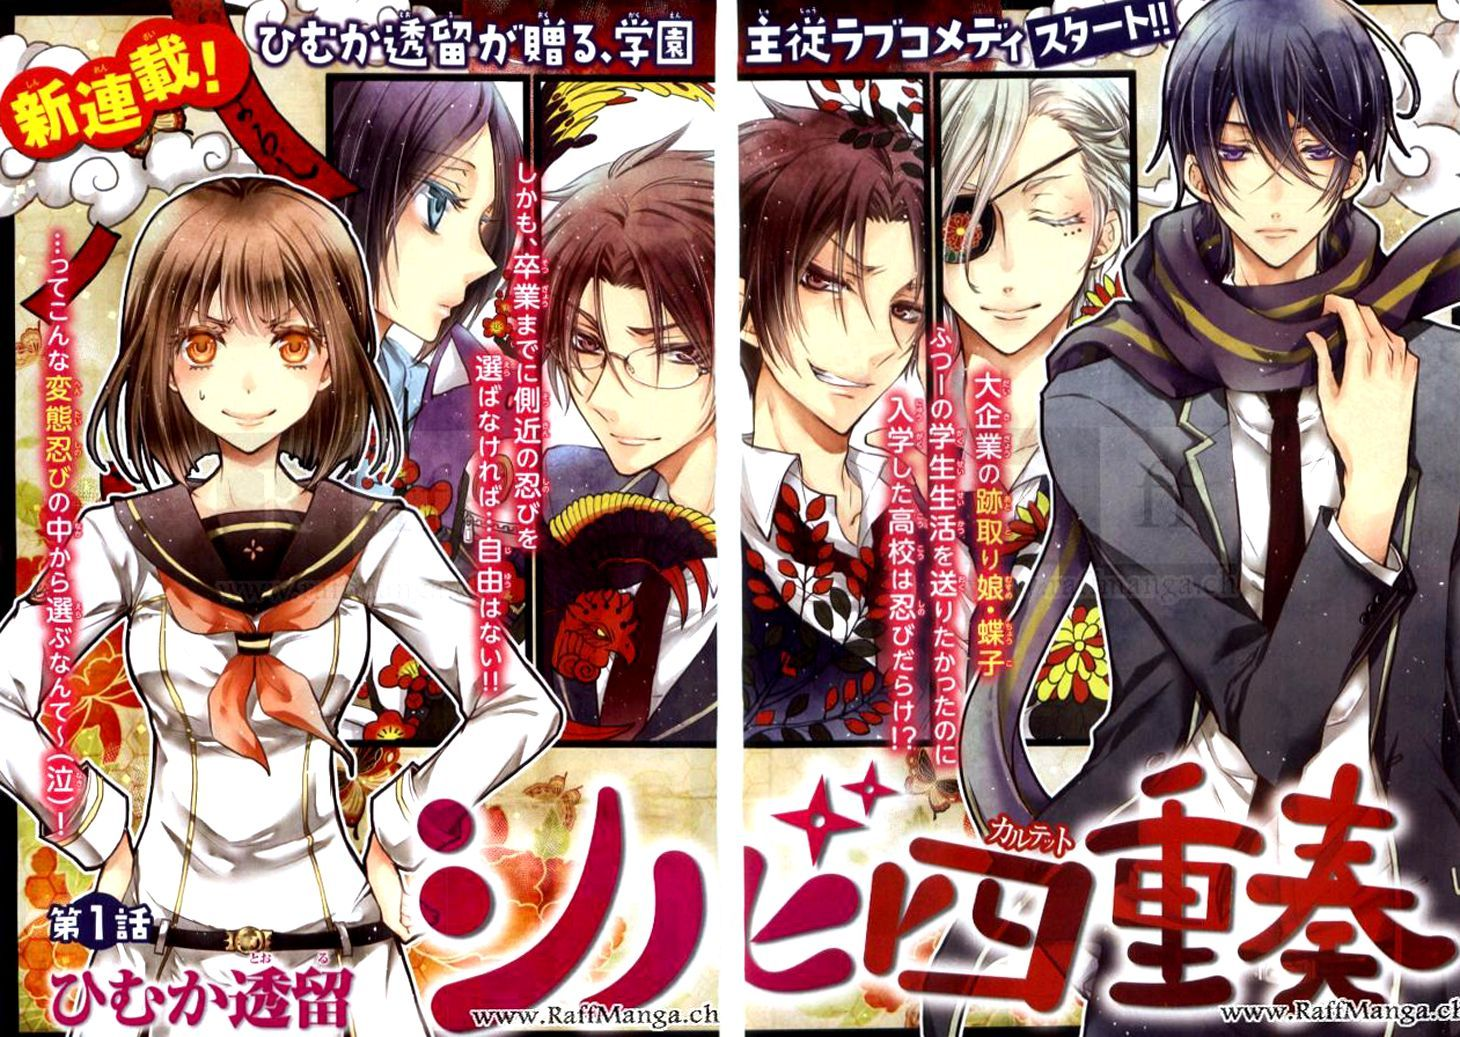 MangaHere Mobile (With images) Anime, Manga anime, Manga